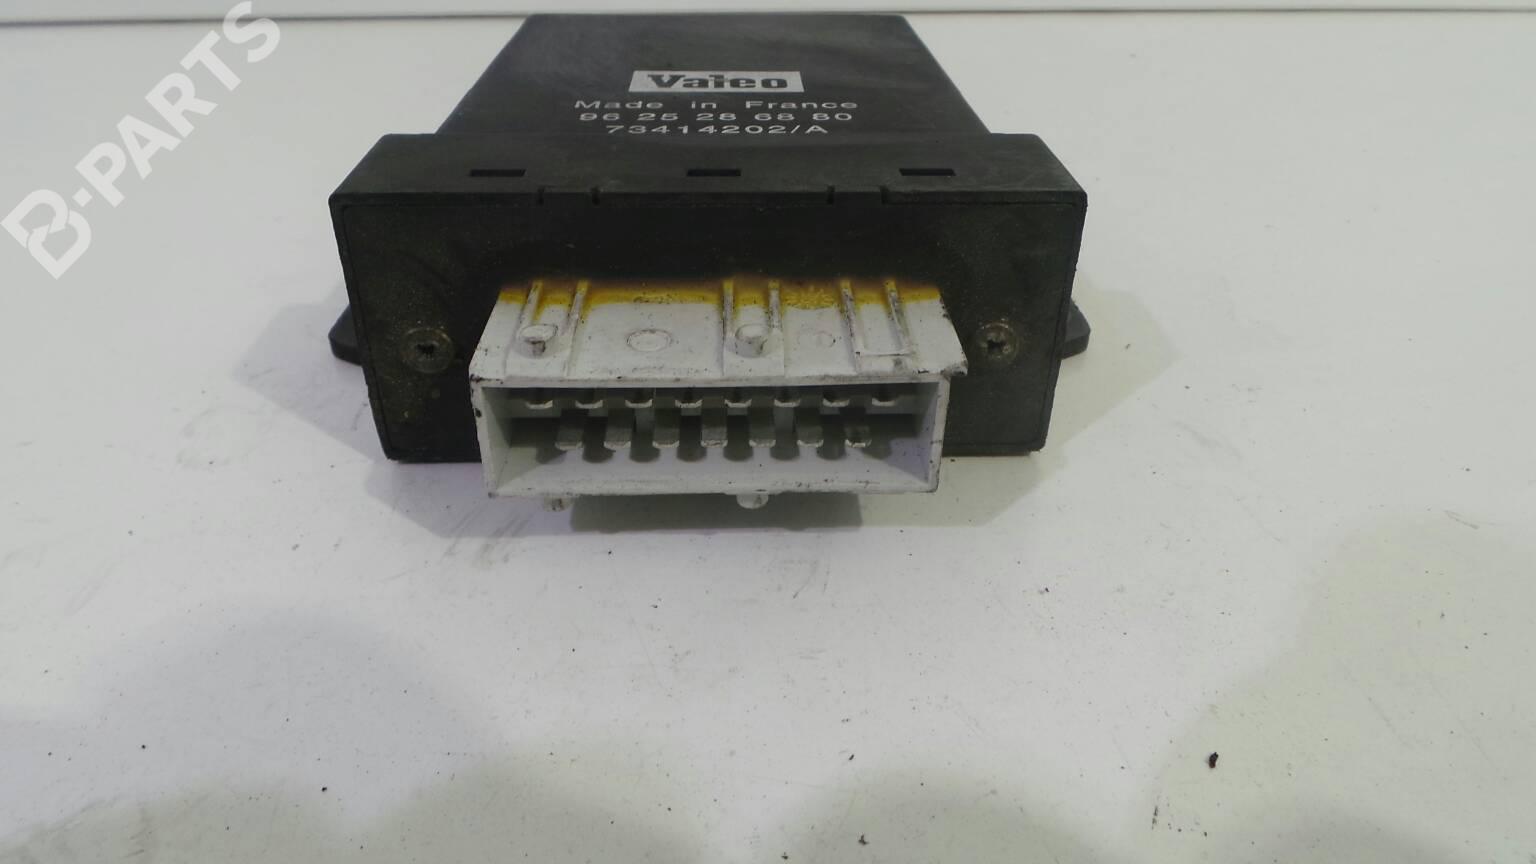 Fuse Box Peugeot 406 8b 19 Td 1205723 Doors 96 25 28 68 80